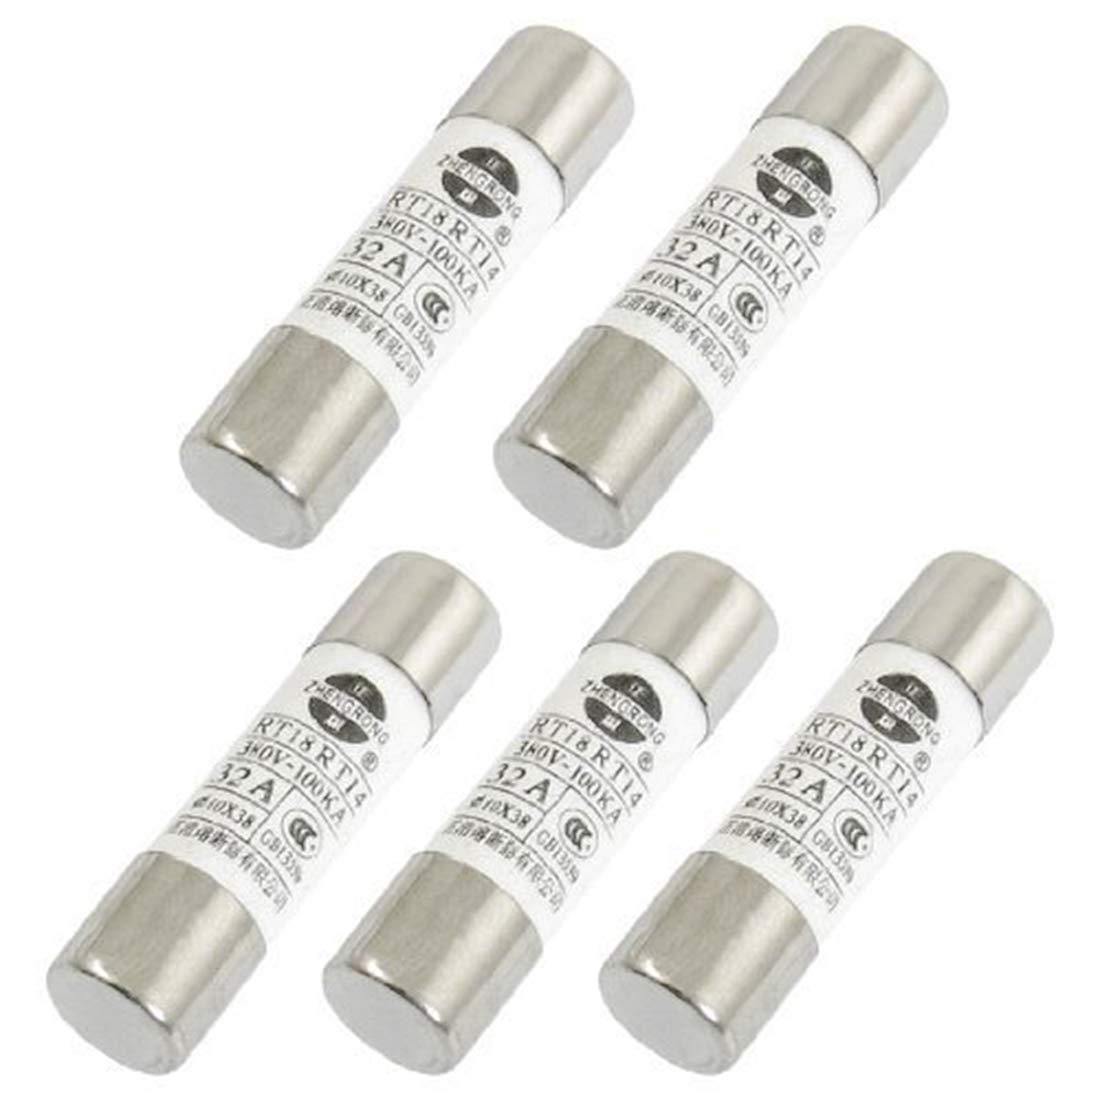 Aodesy 380V 32A Fast Acting Ceramic Cartridge Fuse Low Breaking Cylinder Cap Ceramic Fast Blow Fuse Links 10x38mm,Pack of 5 Shenzhenshiaodesiwujinjidianyouxiangongsi